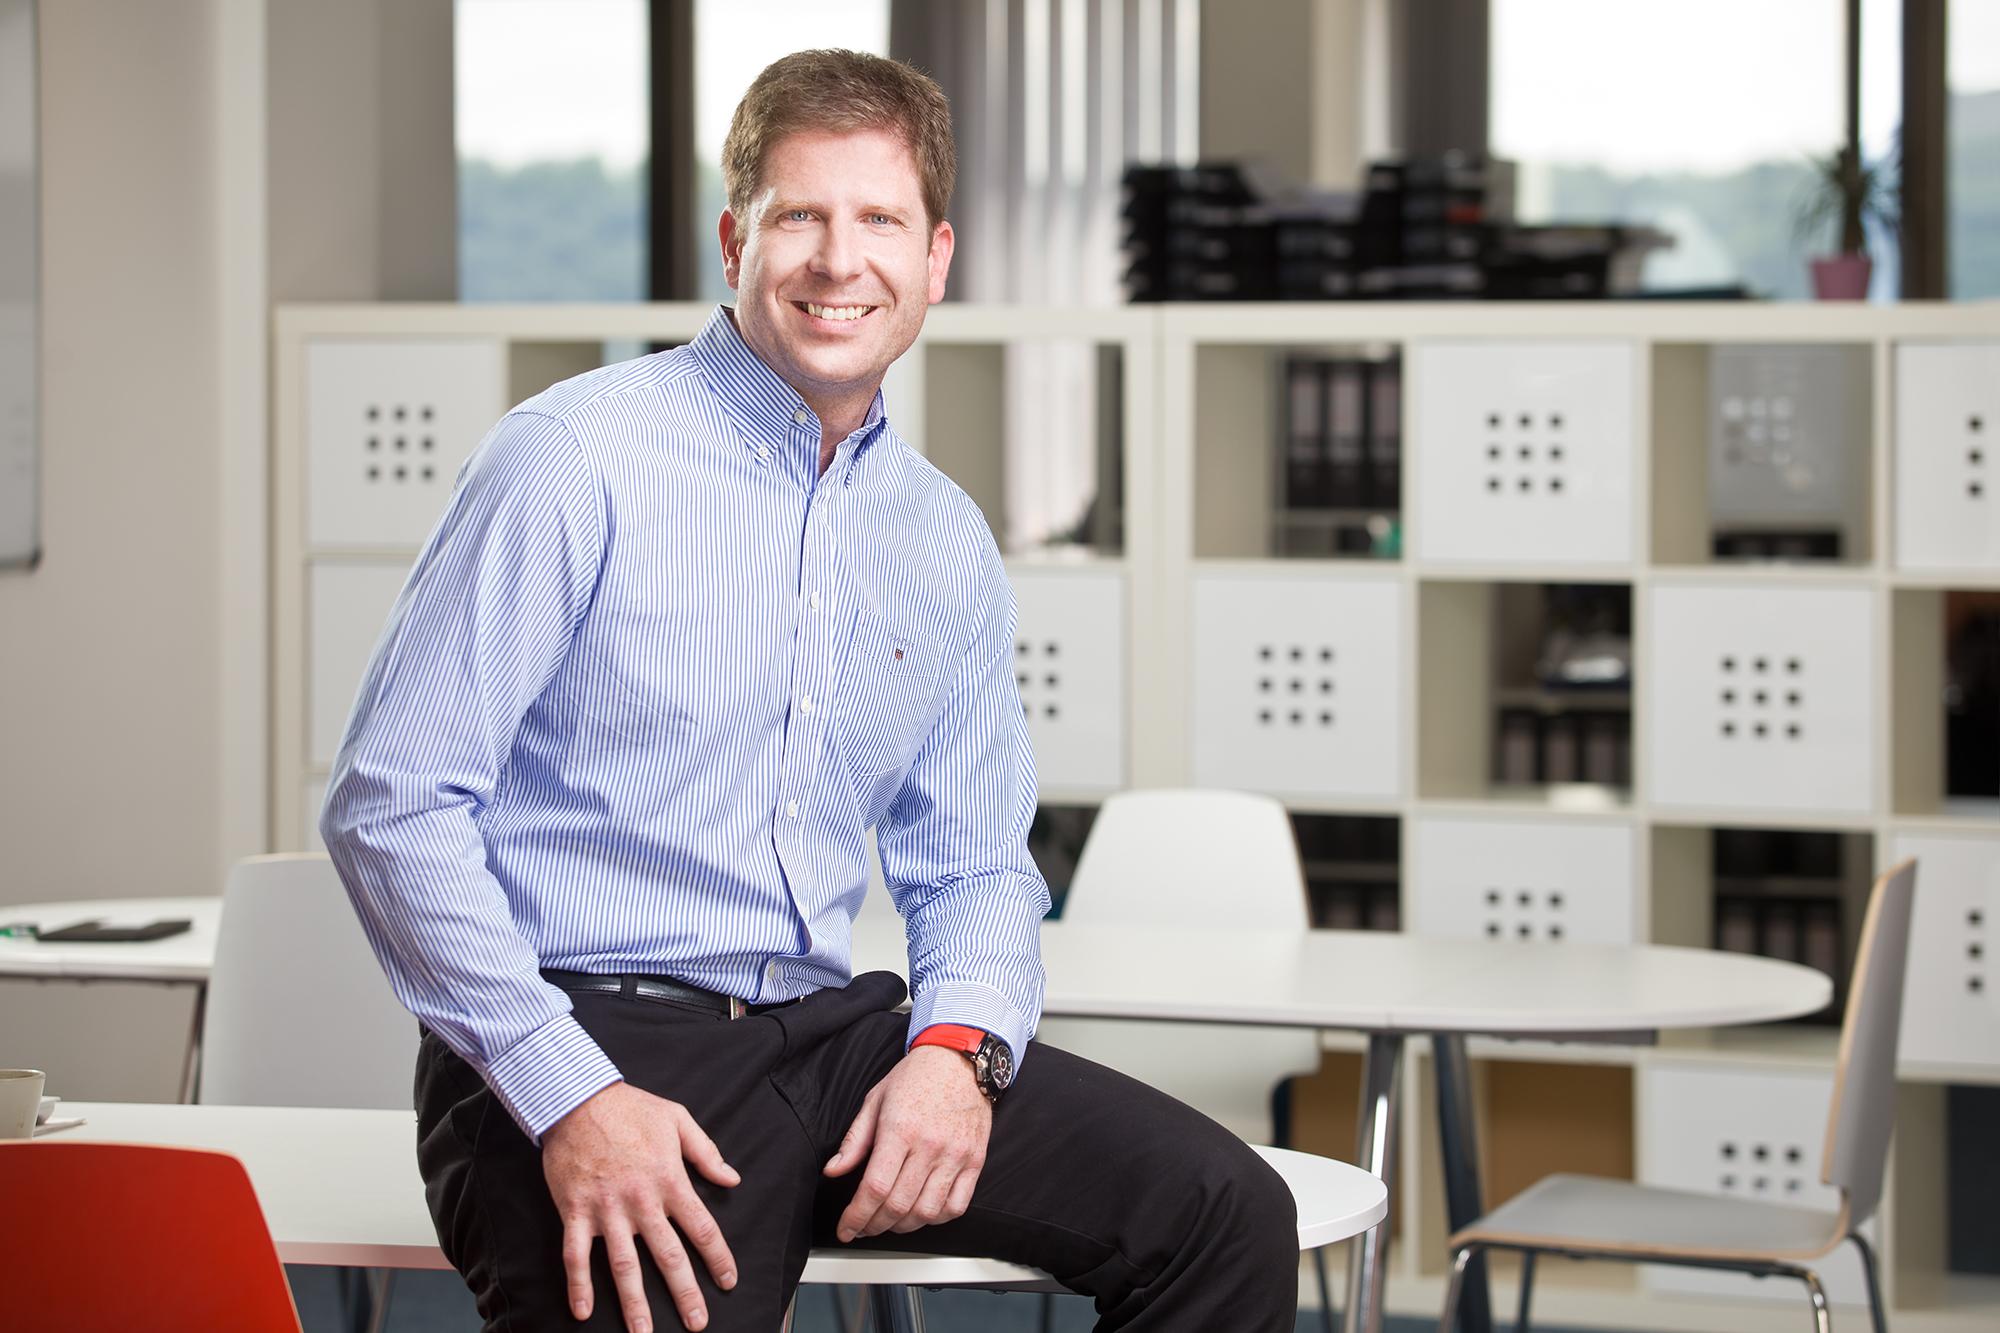 Vit Endler inwestuje w Virtooal